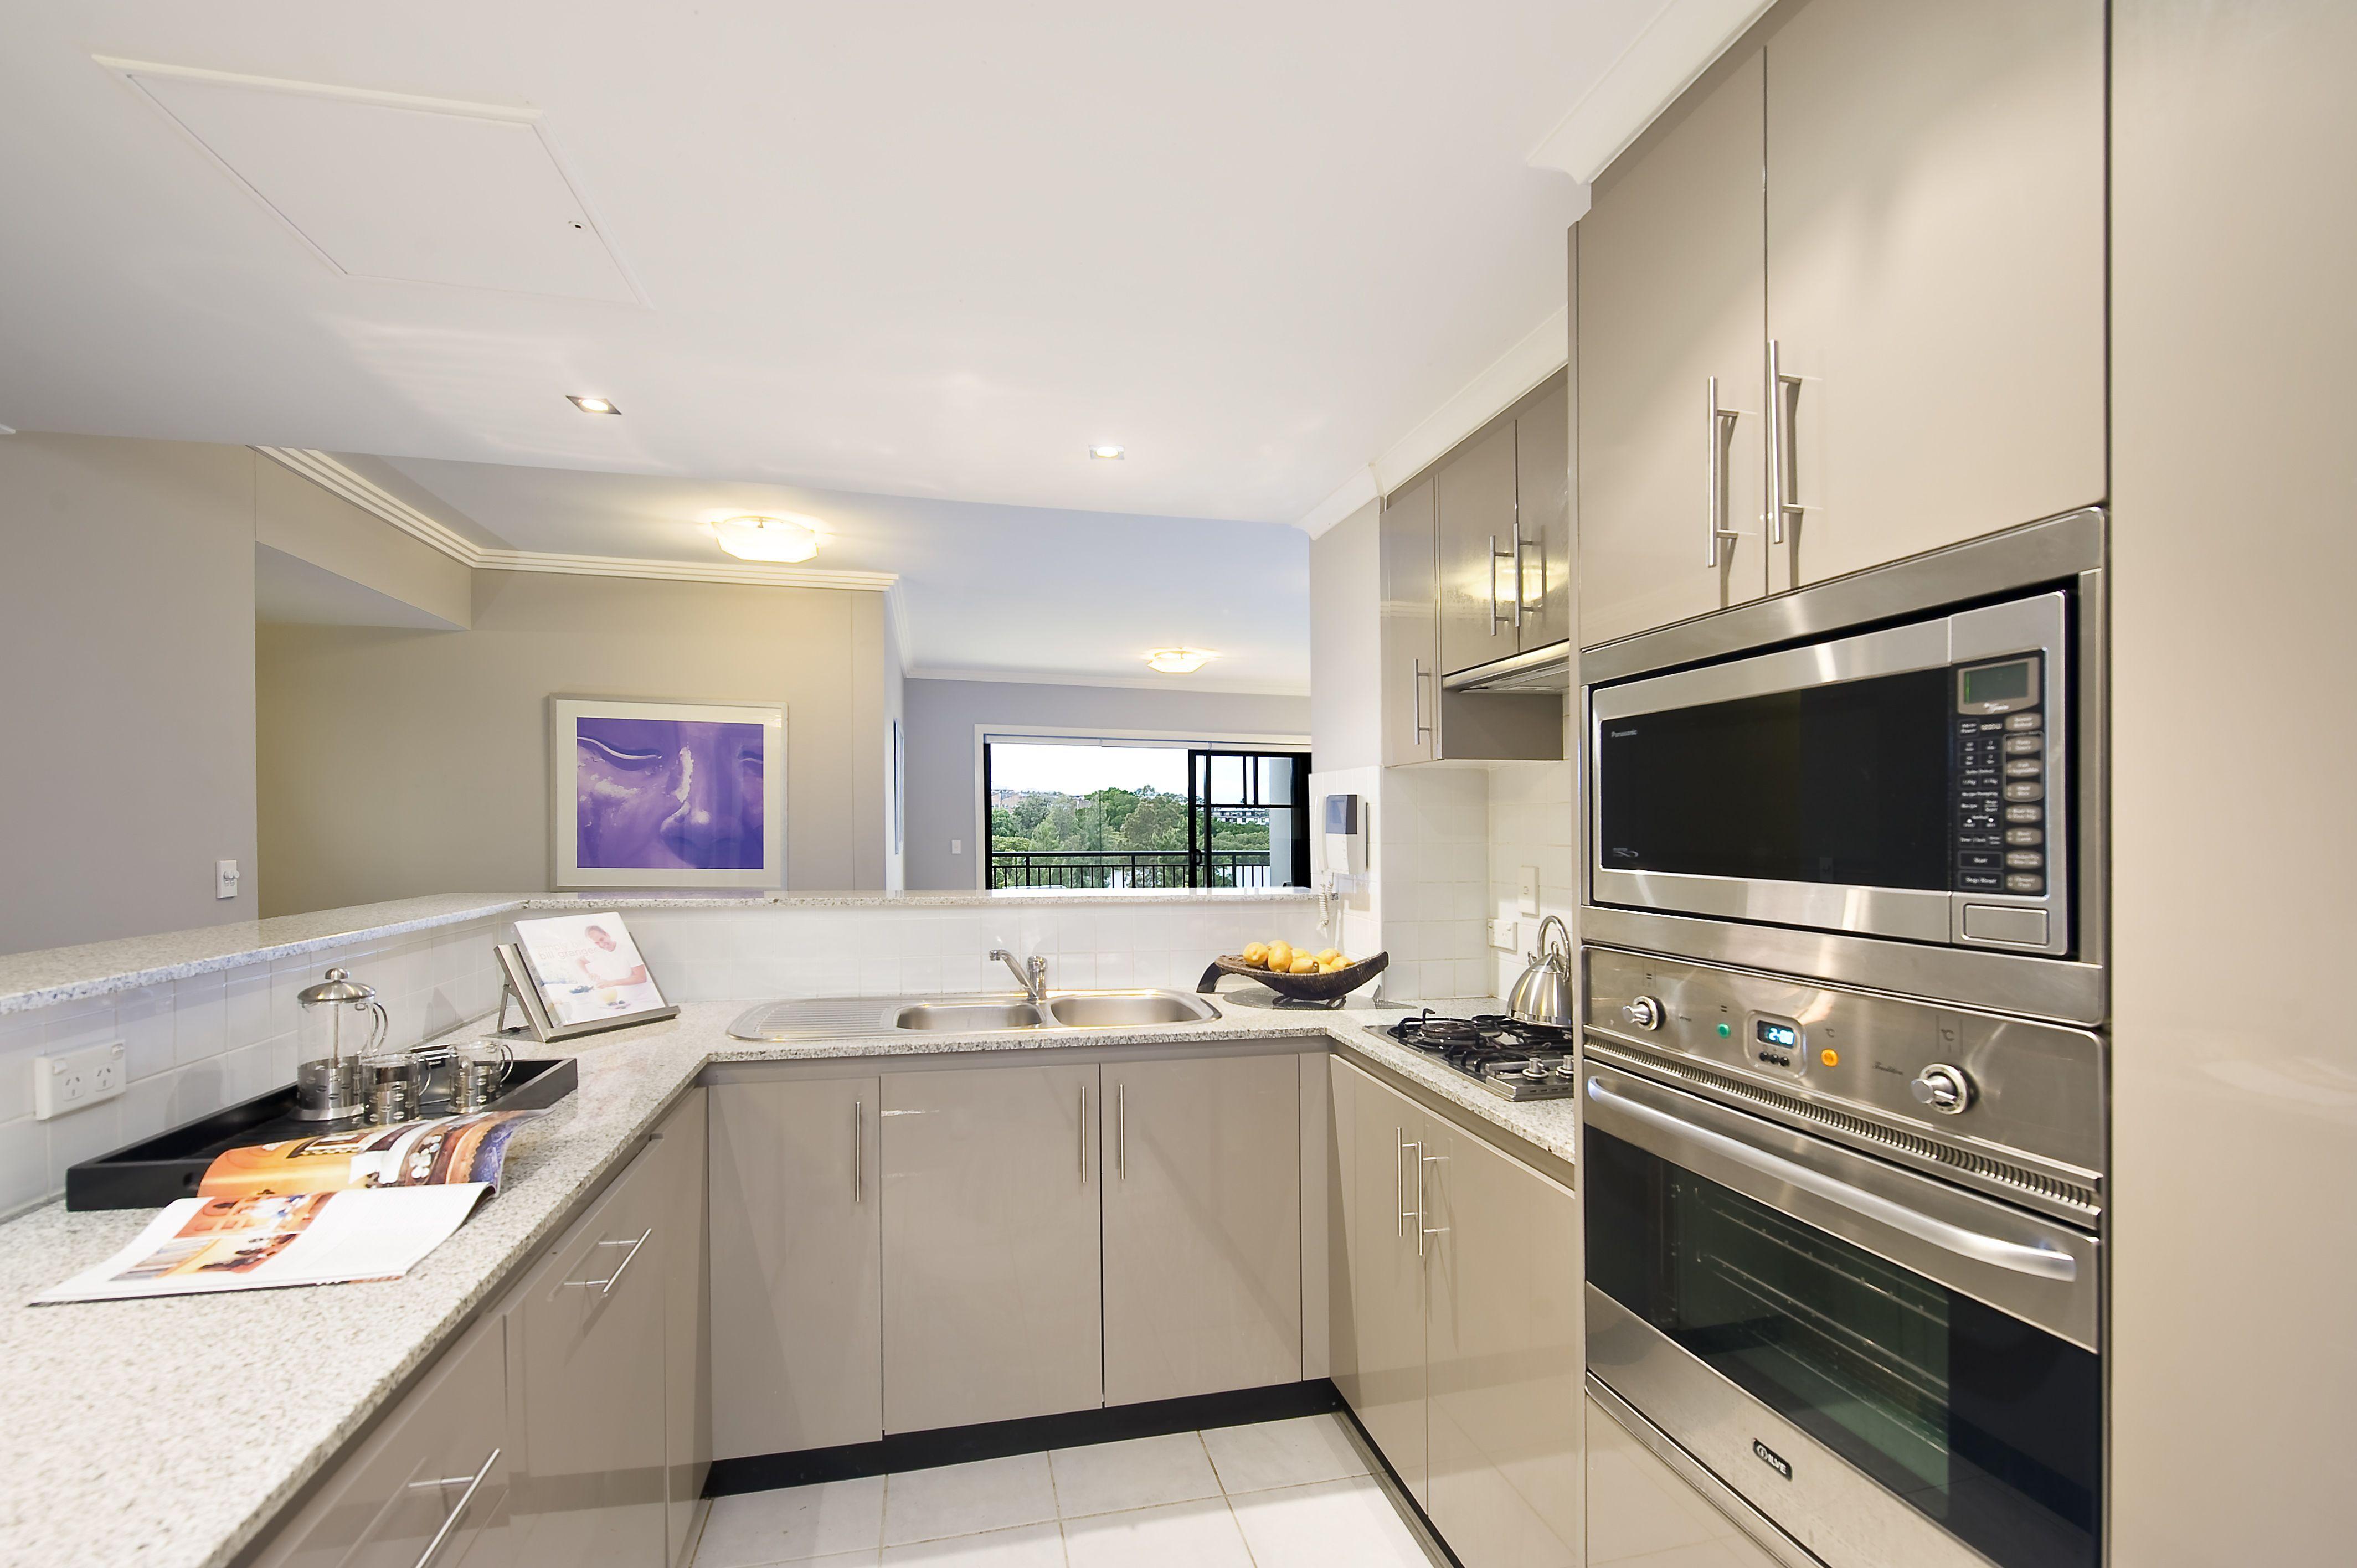 10/143 Bowden Street, Meadowbank NSW 2114